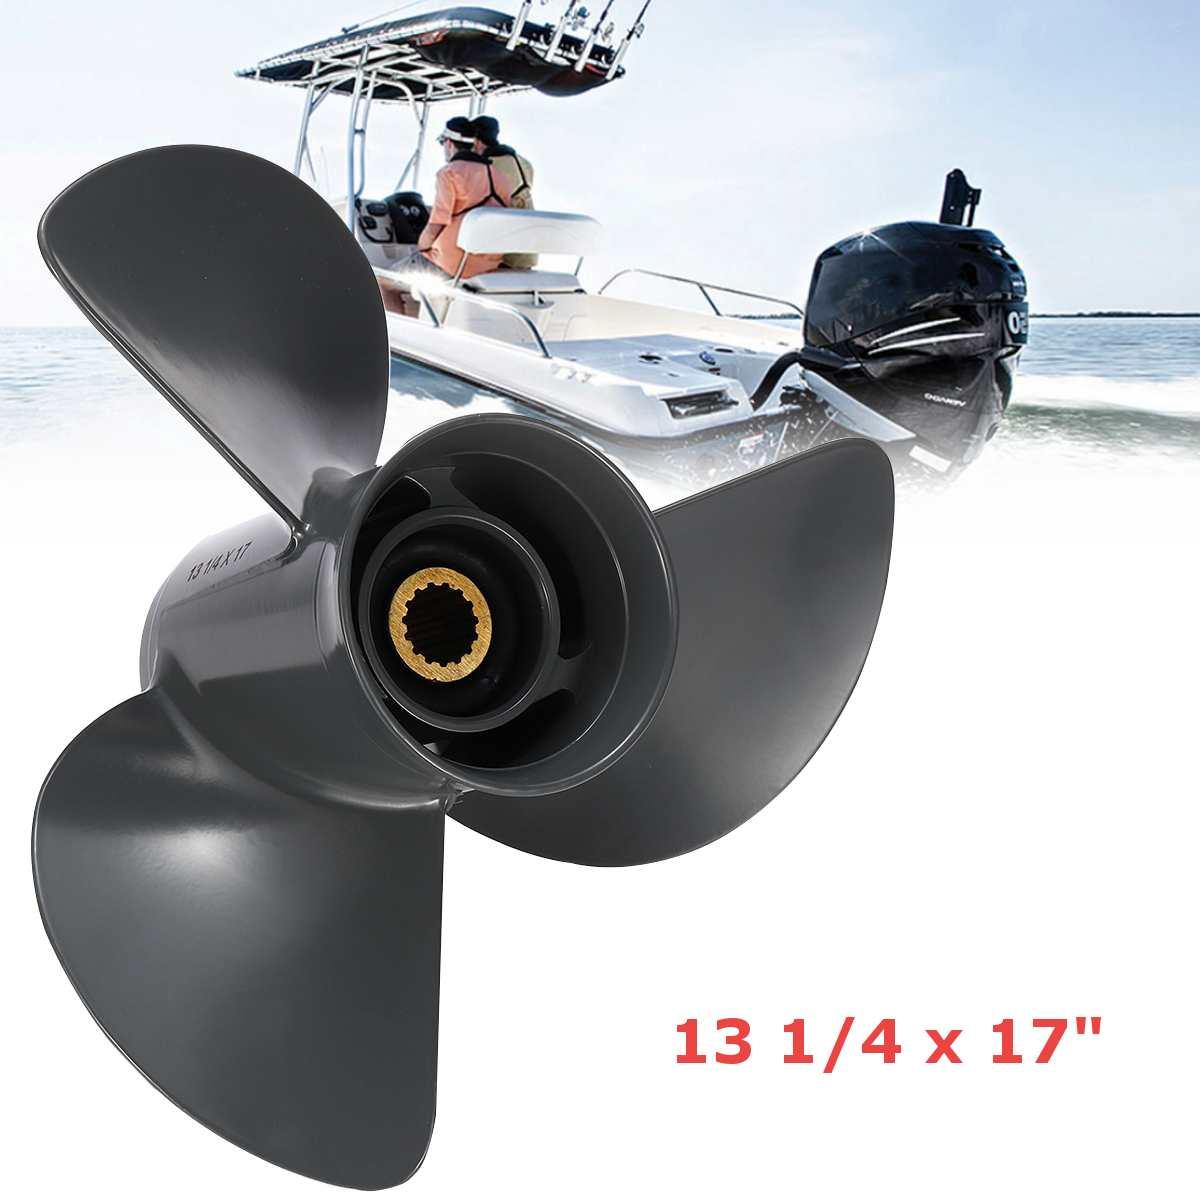 Audew 13 1/4 X 17 Outboard Propeller For Mercury Mariner 70-150HP 48-77344A45 Aluminium Alloy Marine Propeller 15 Spline Tooth